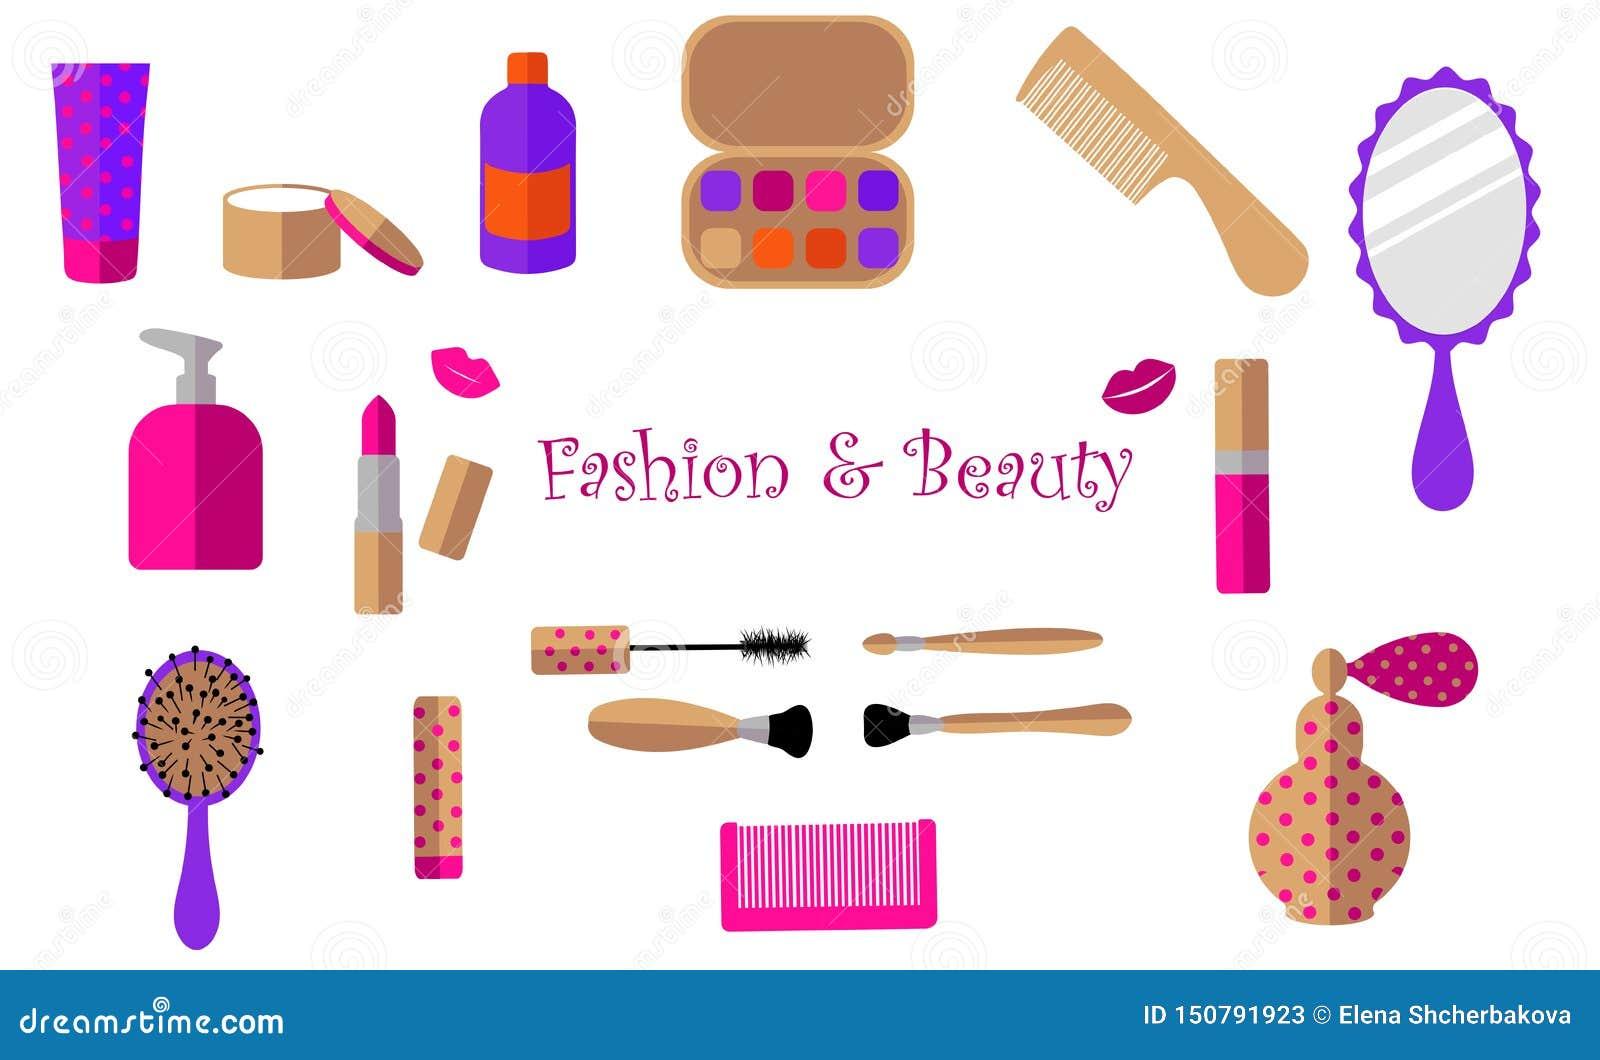 Lipstick, cream, jar, mascara, perfume, bottle, eye shadow, mirror, comb, lips, brush on a white background